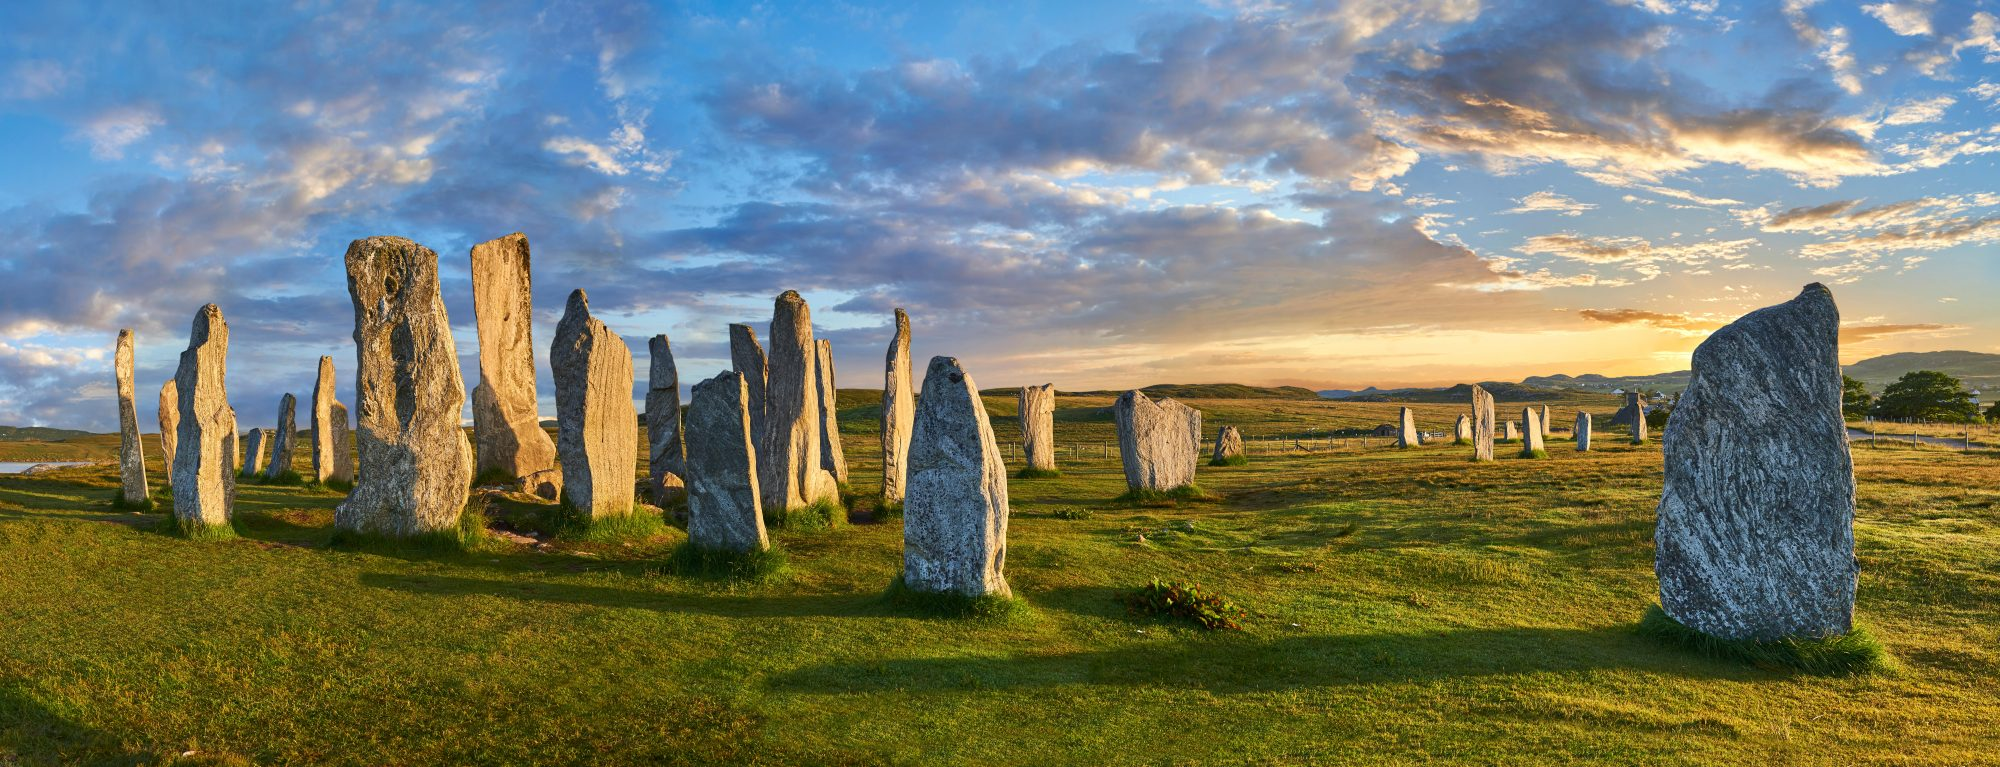 Panorama Of Calanais Standing Stones Central Stone Circle Erected Between 2900 2600bc, Scotland